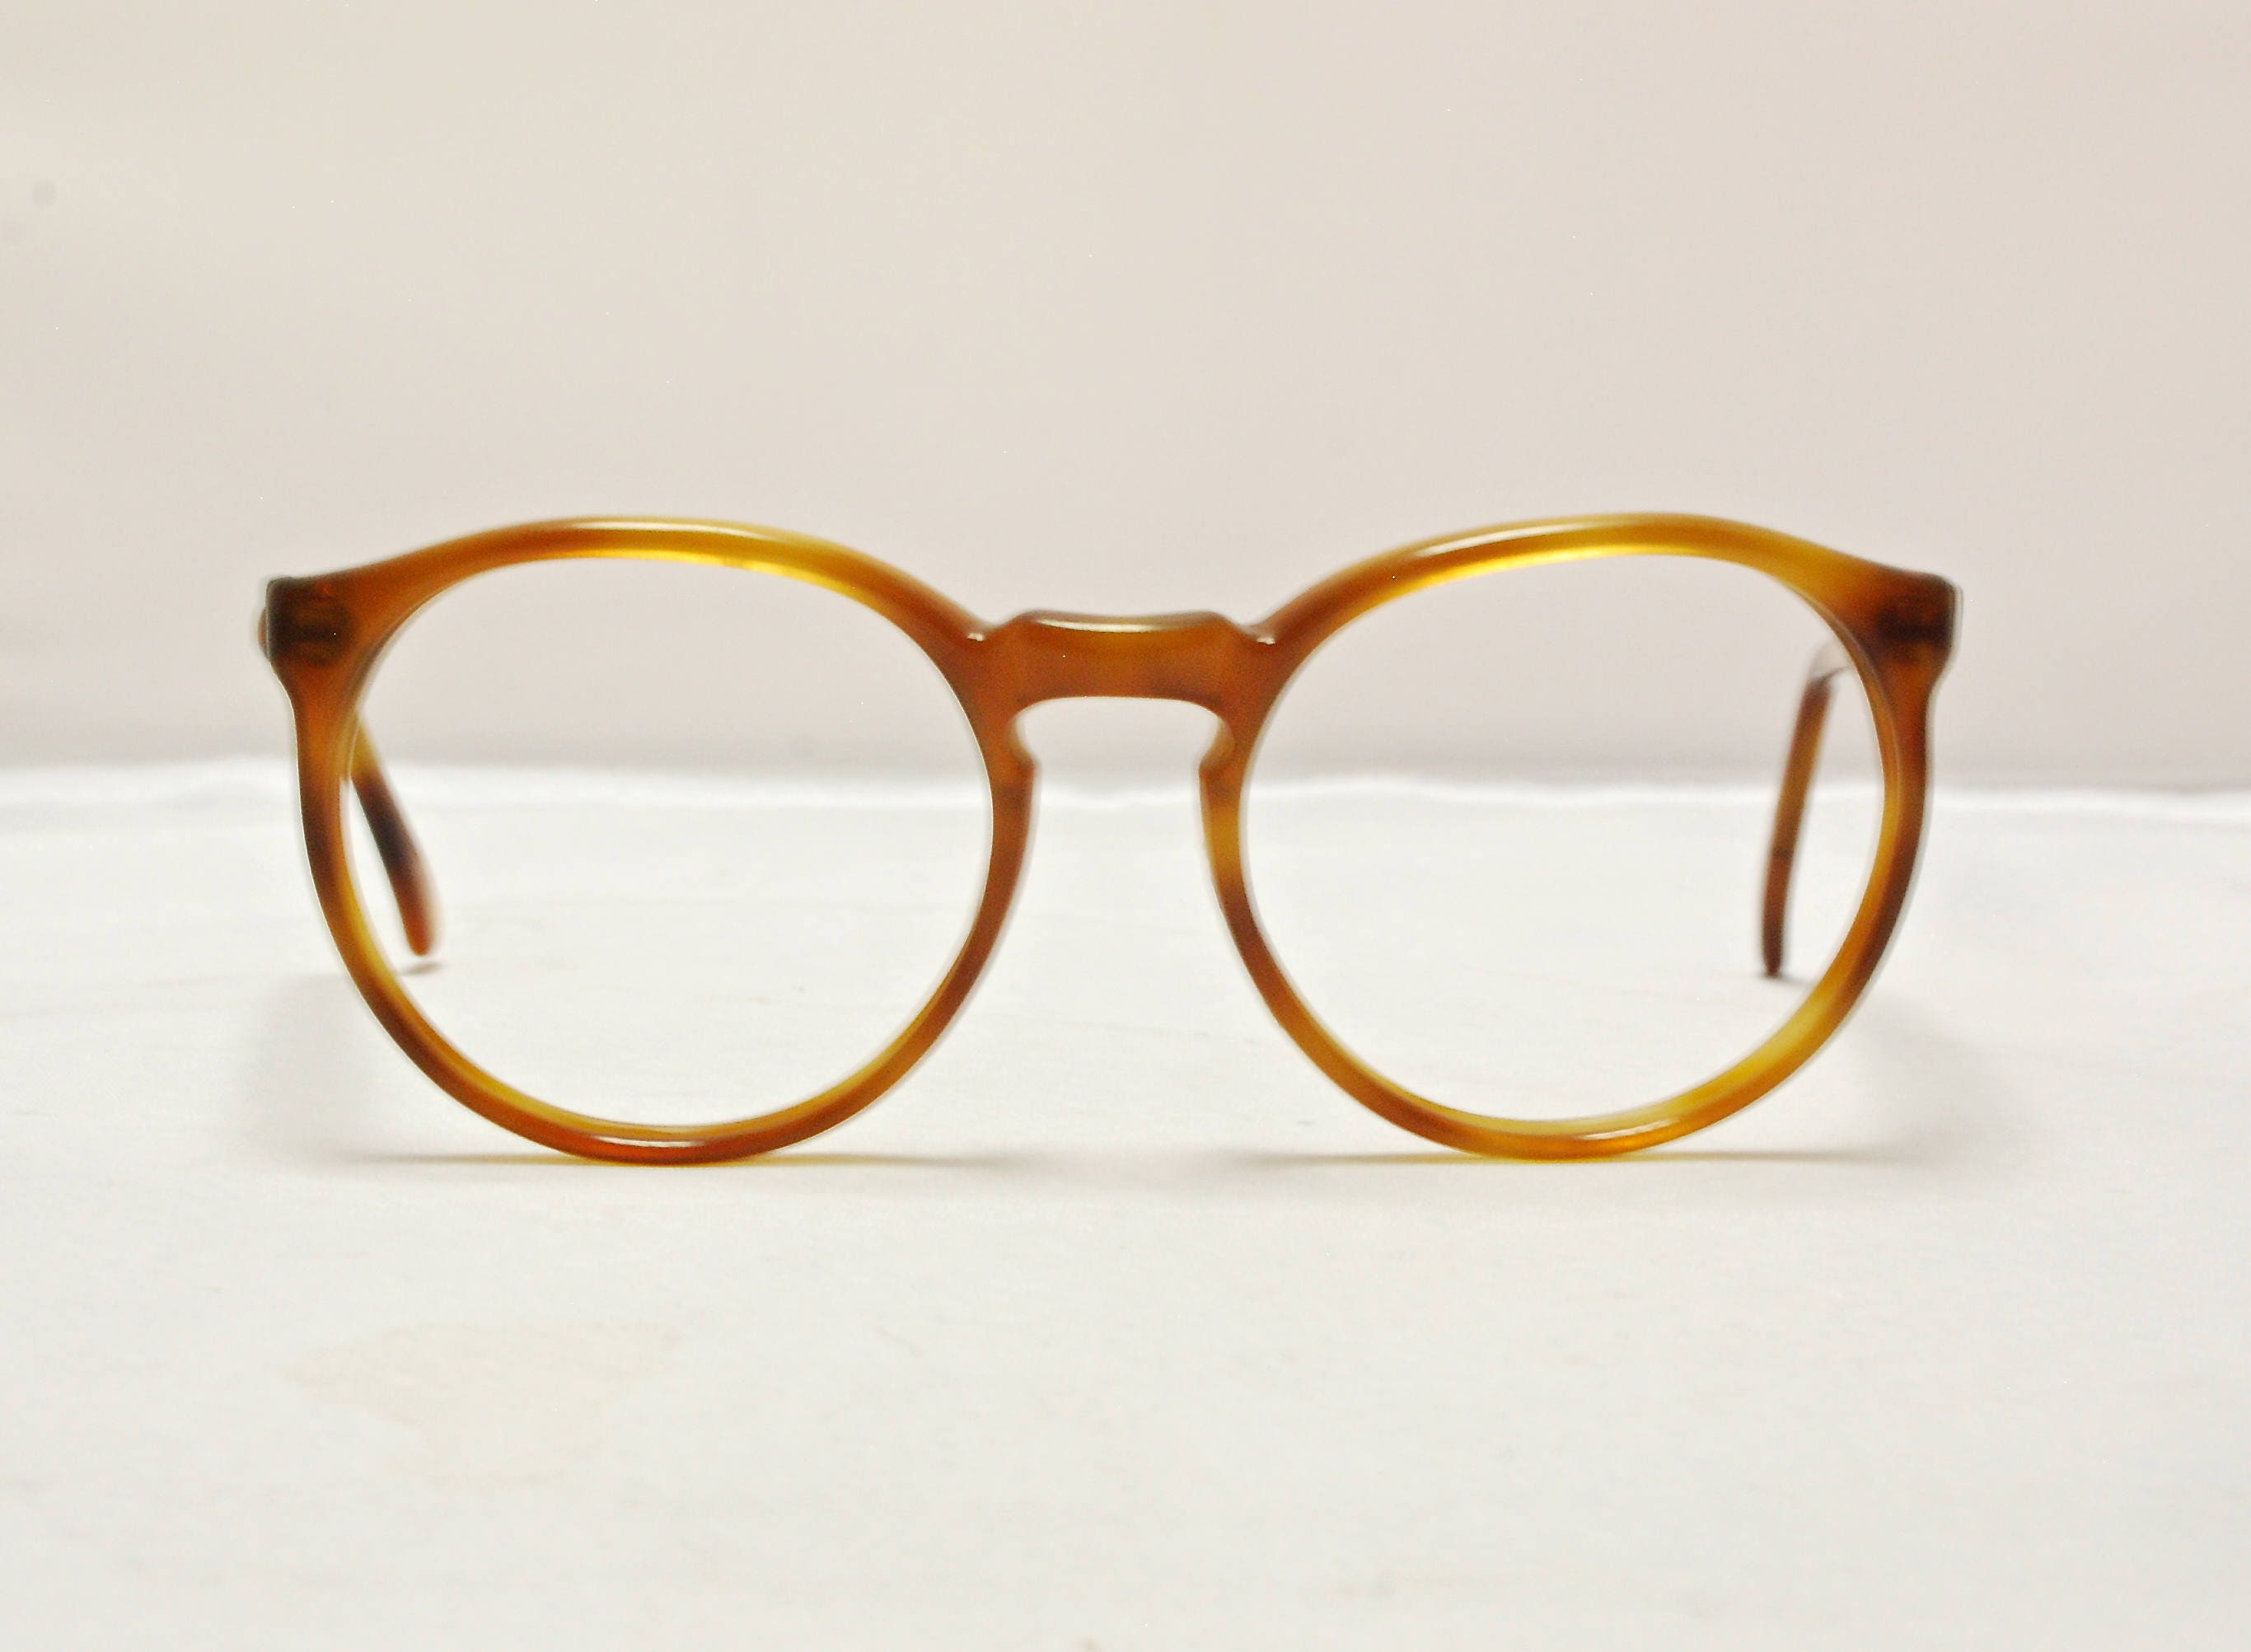 97e590894d635 Vintage POLO 1 by RALPH LAUREN Eyeglasses Tortoise Frames / Model# 077 /  Retro Collectable Rare #1332